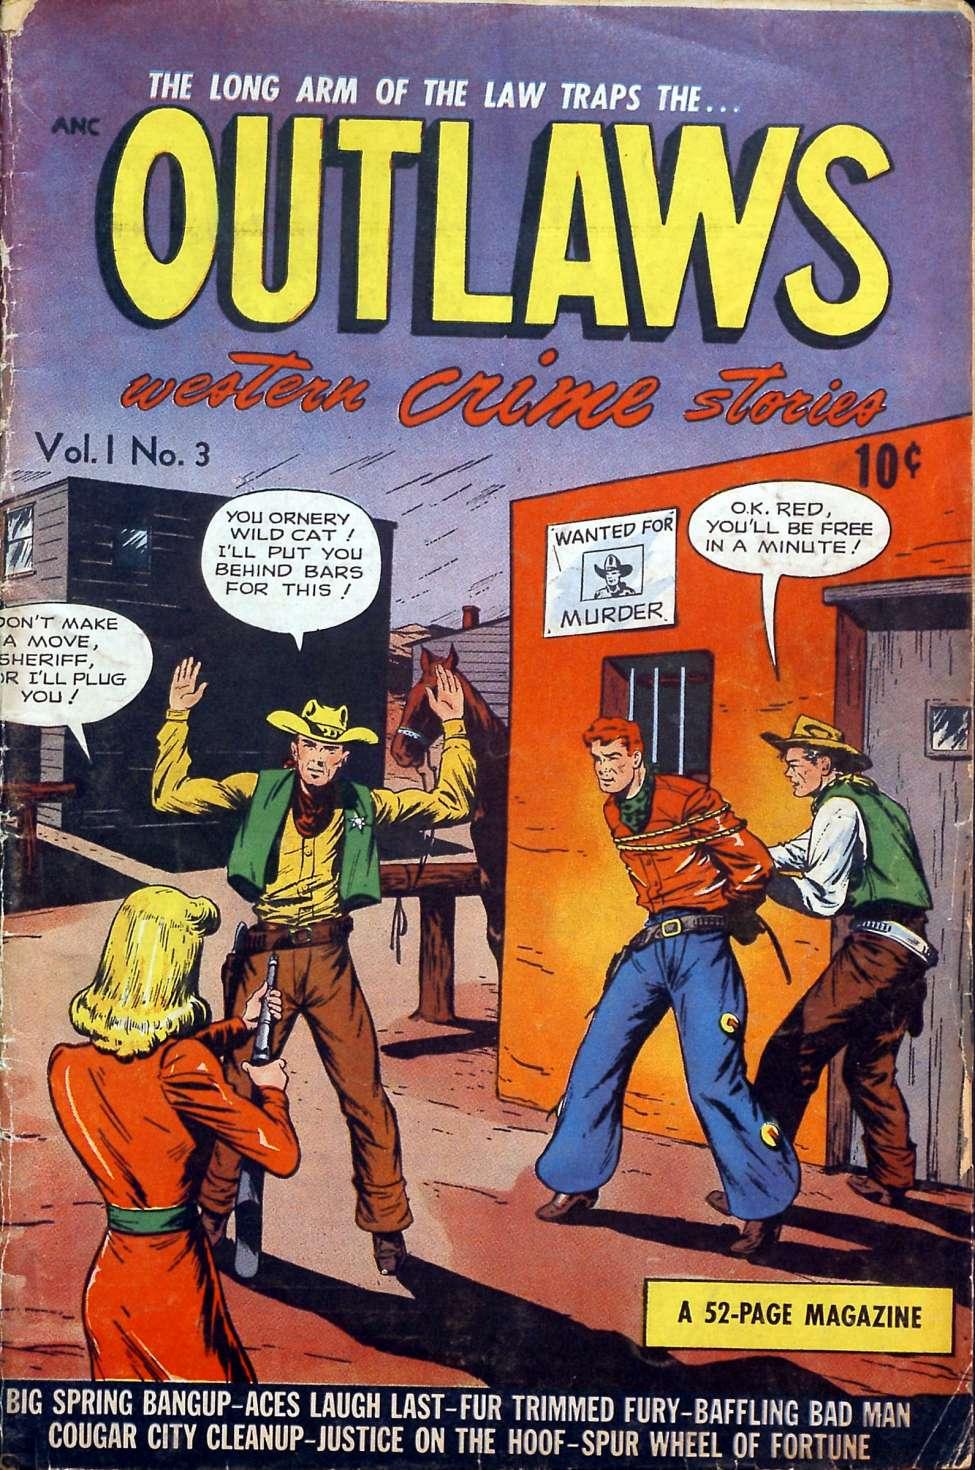 Outlaws v1 #3, DS Publishing